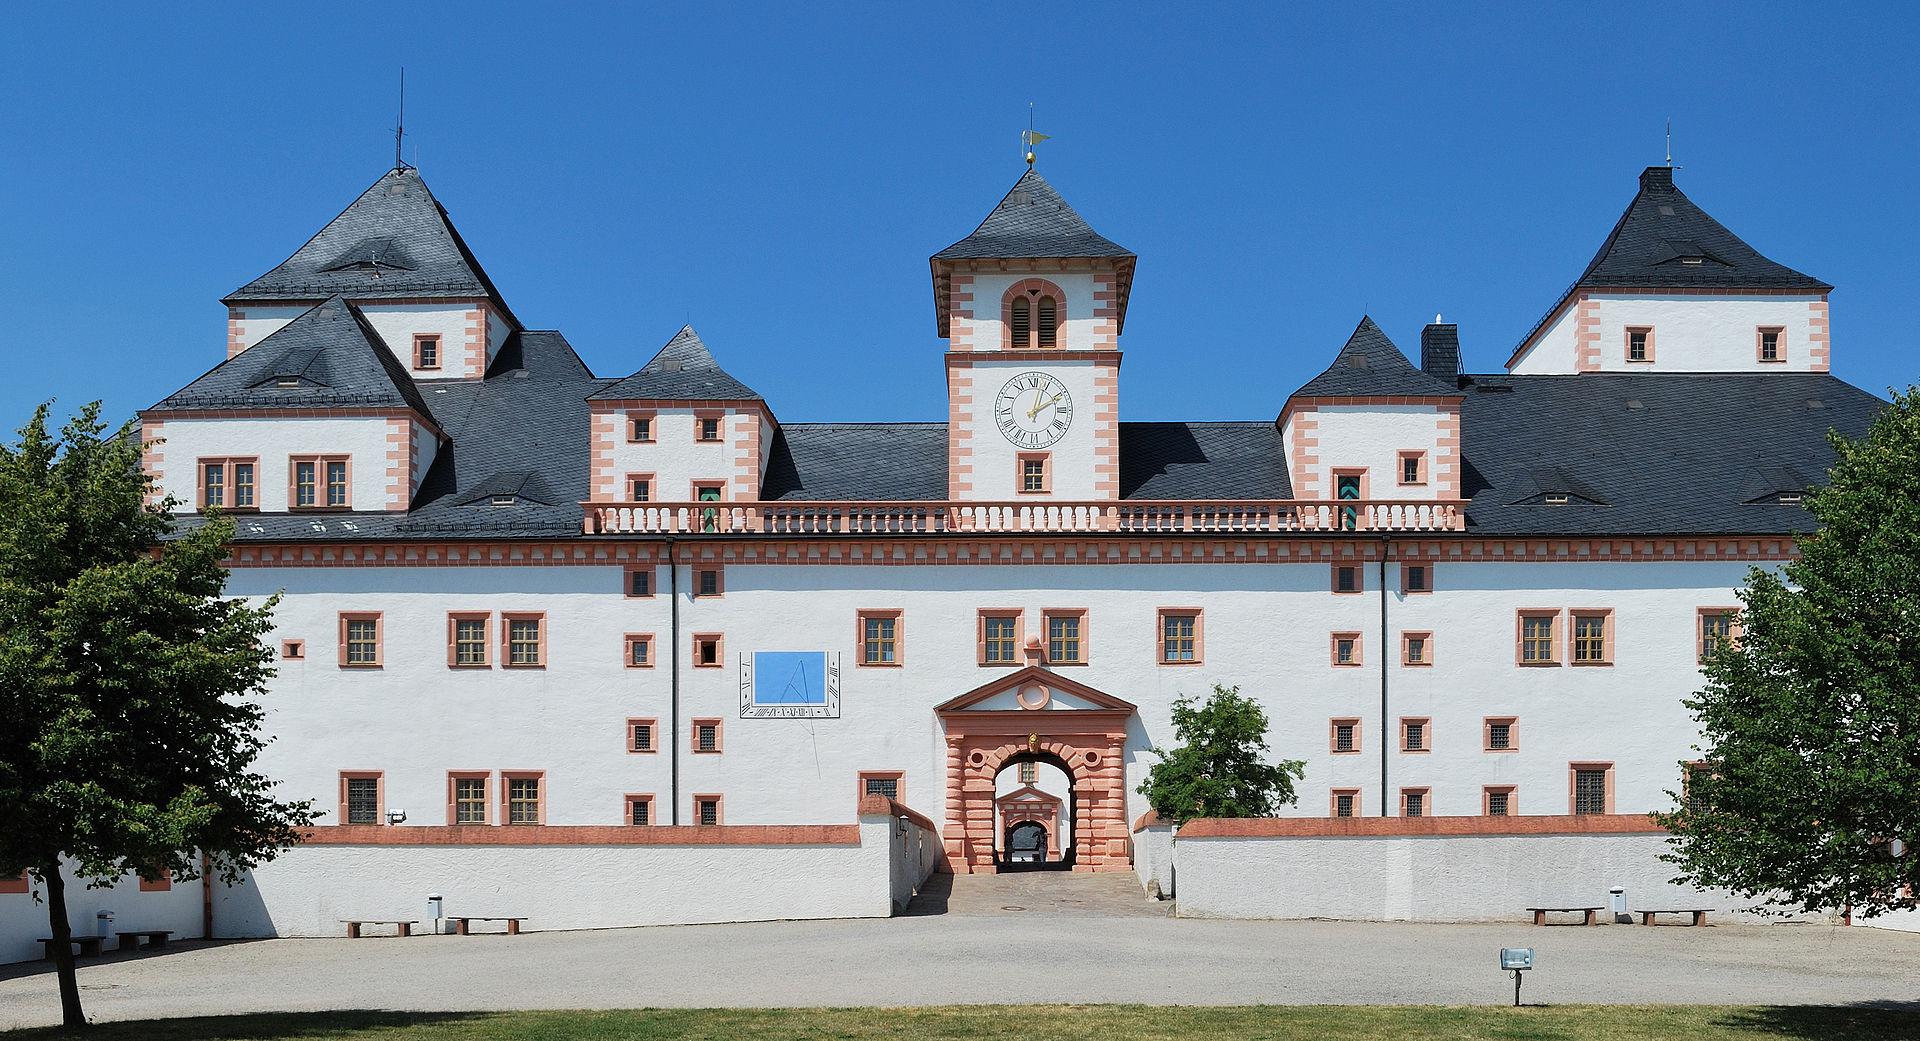 Bild Schloss Augustusburg